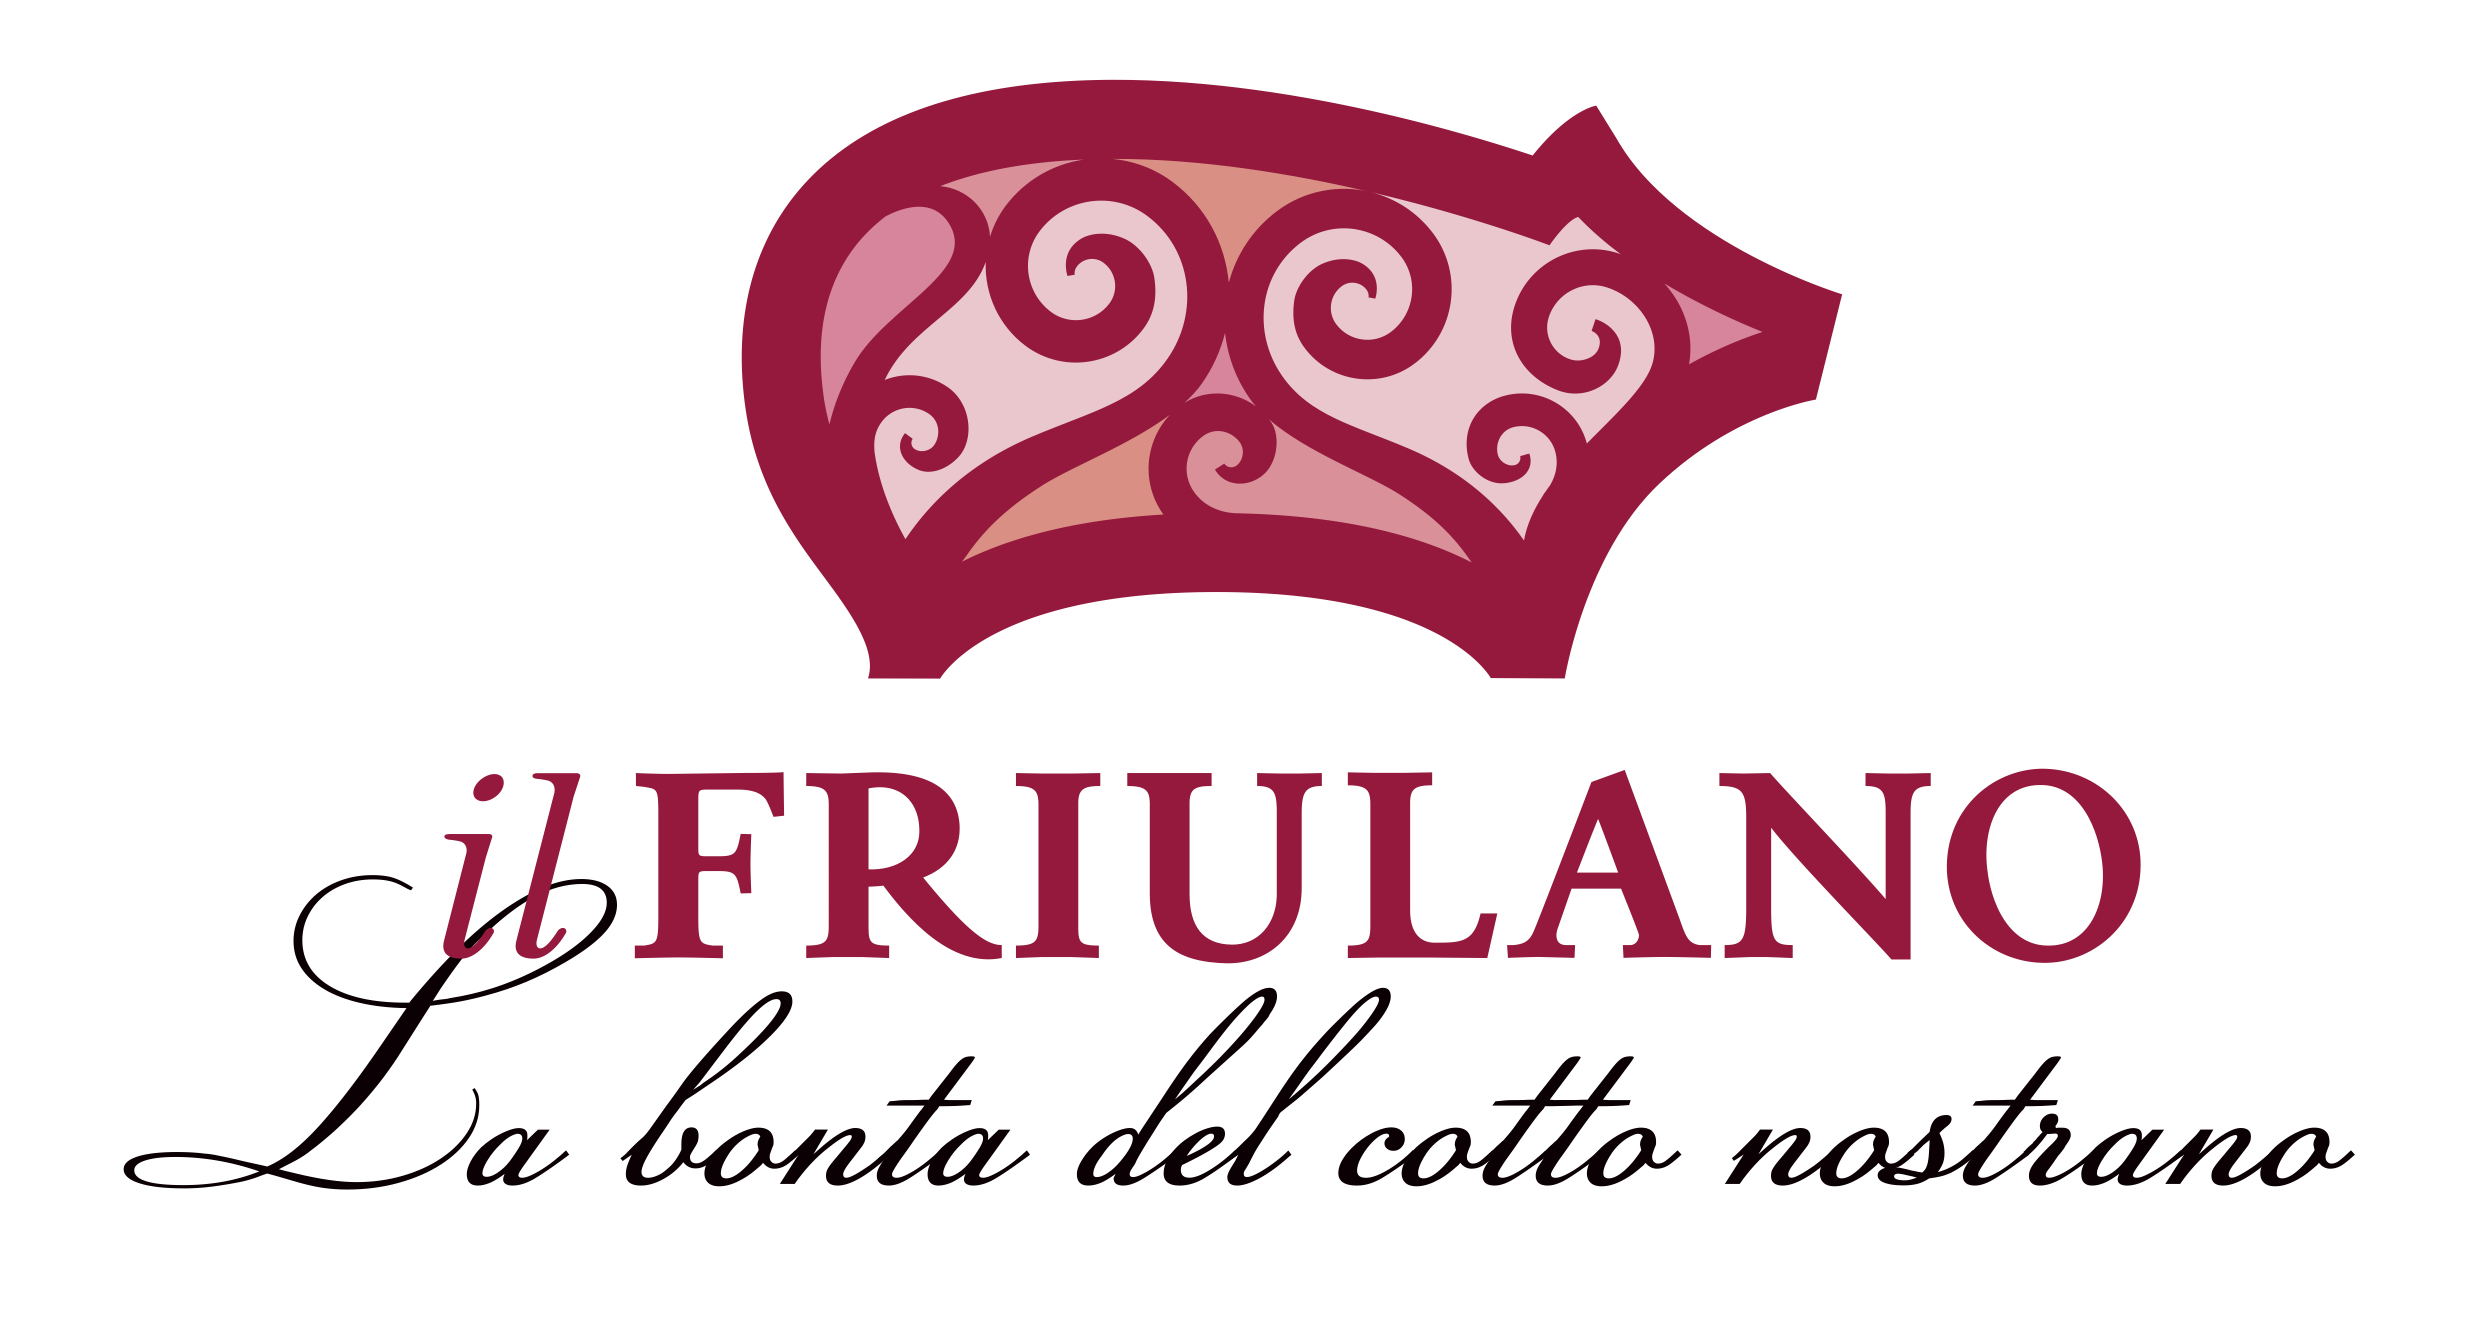 friulano-logo